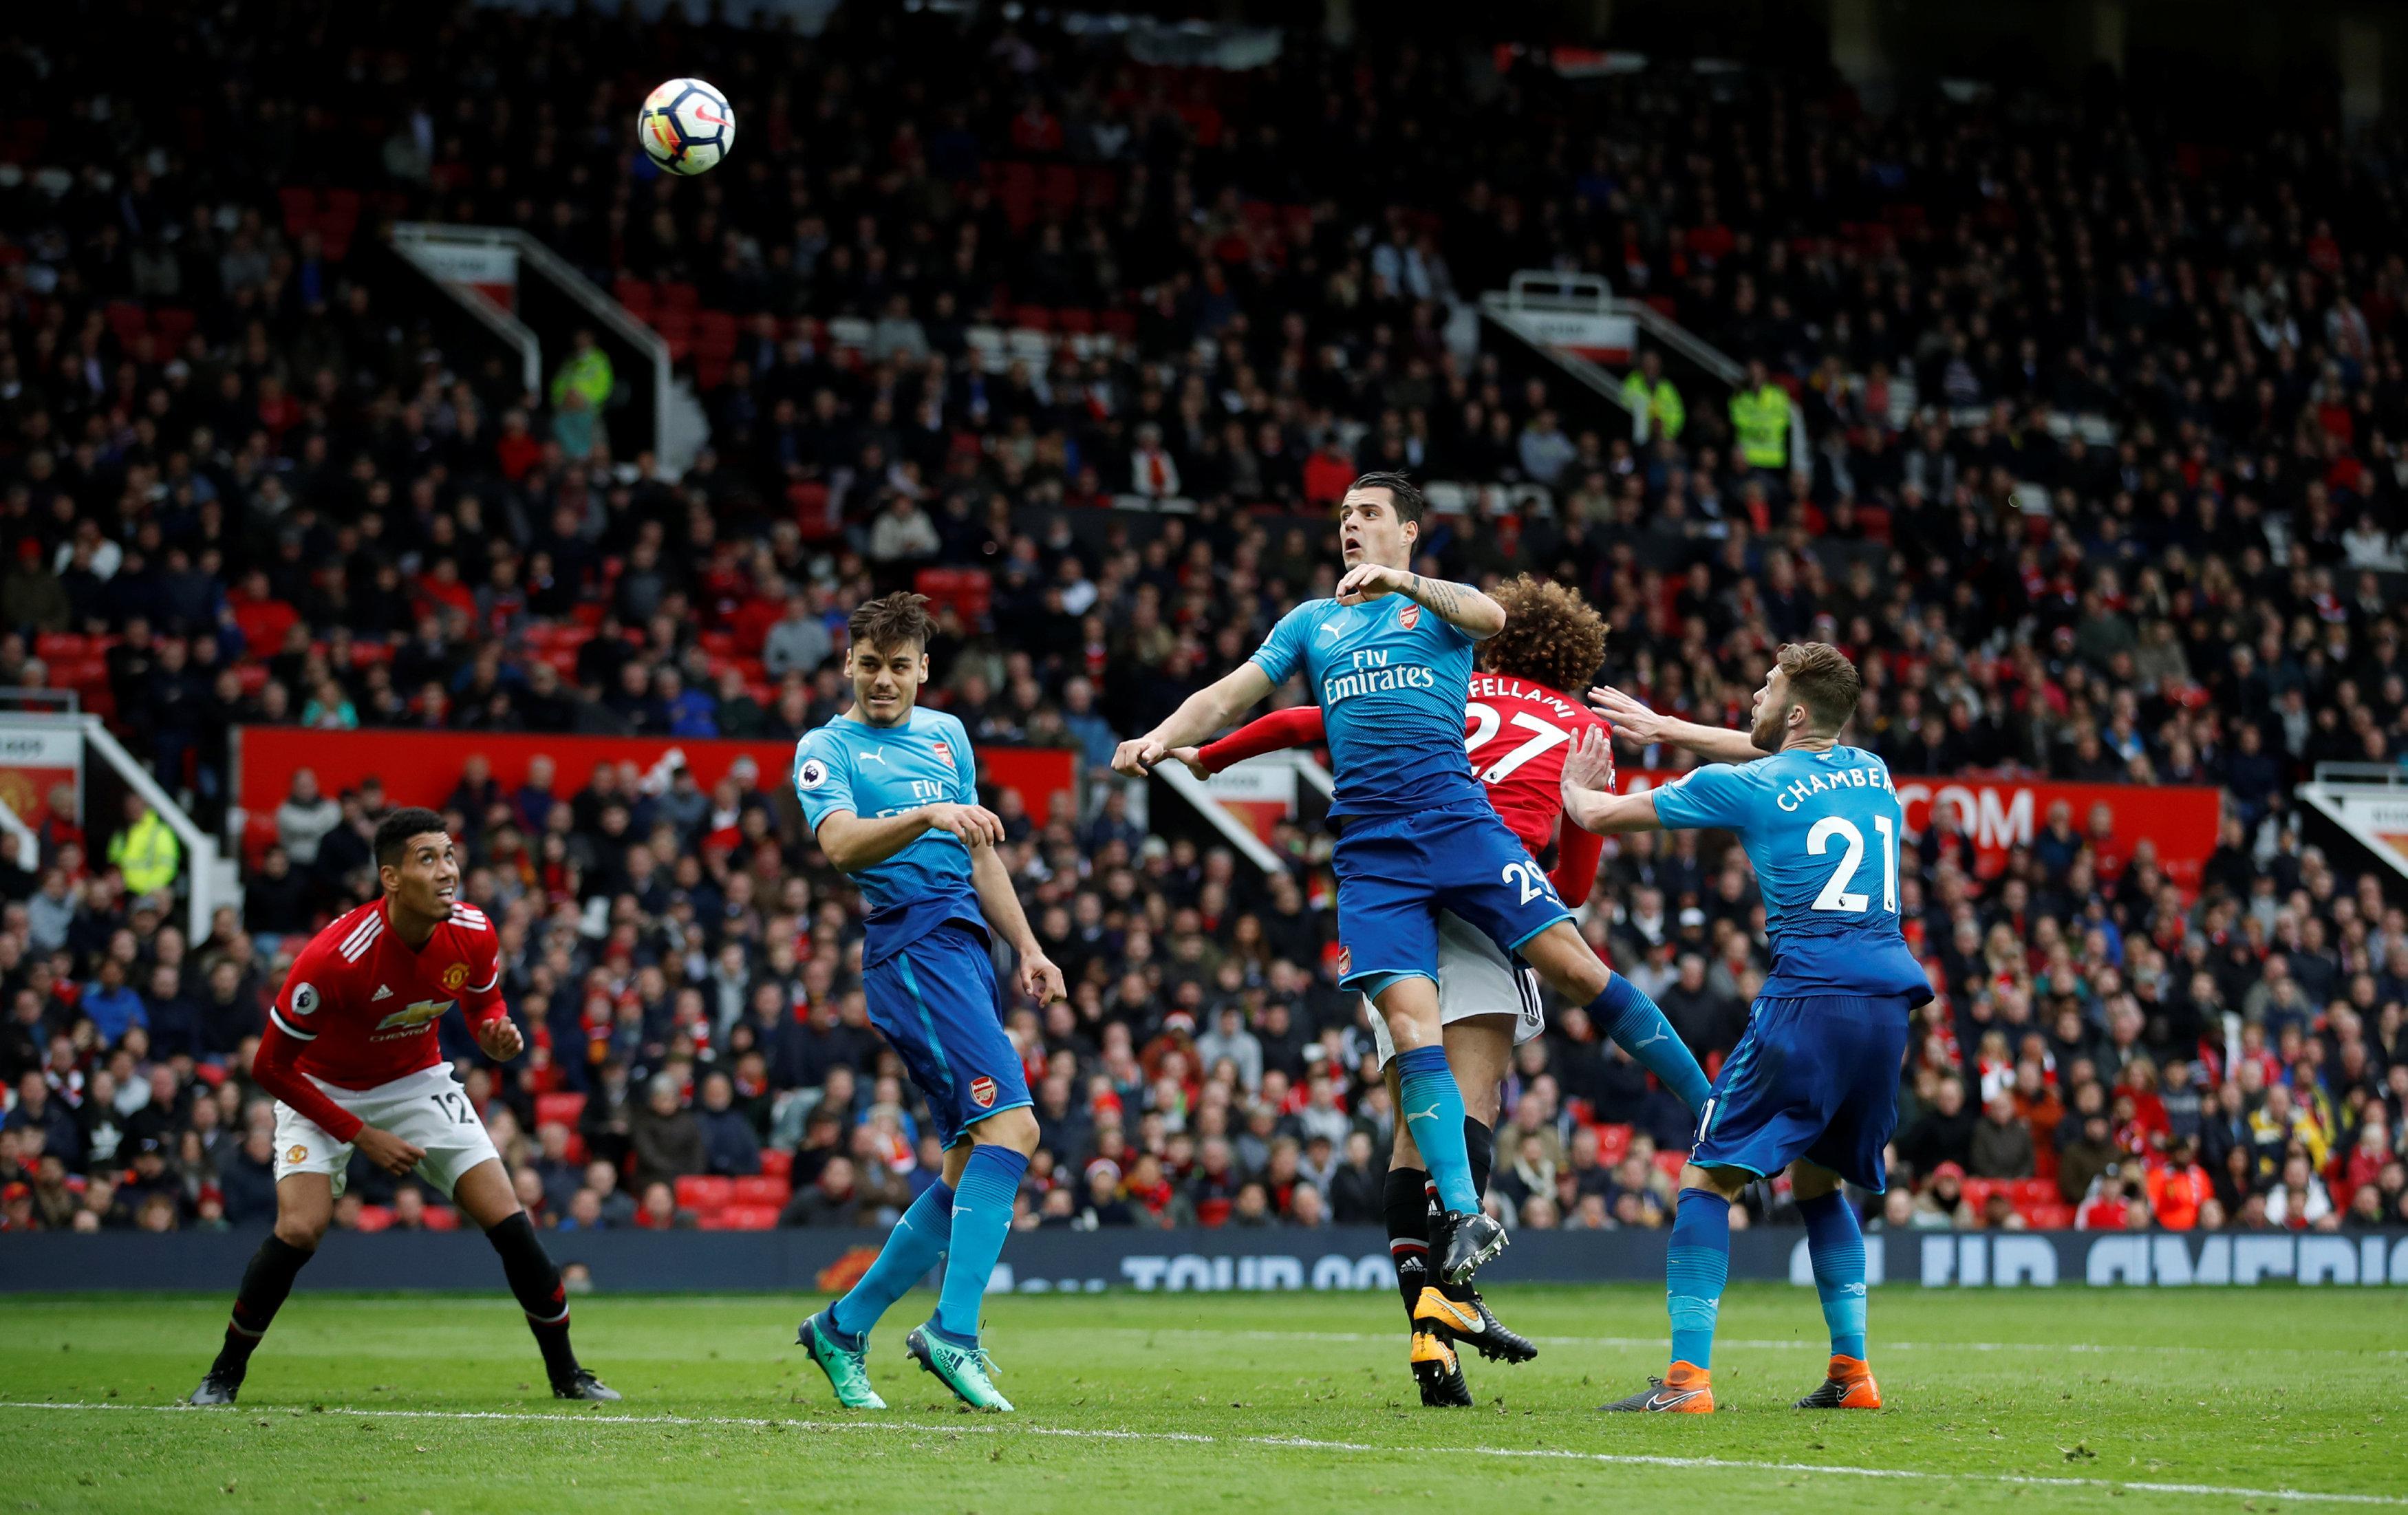 Marouane Fellaini scored an injury time winner as Manchester United beat Arsenal 2-1